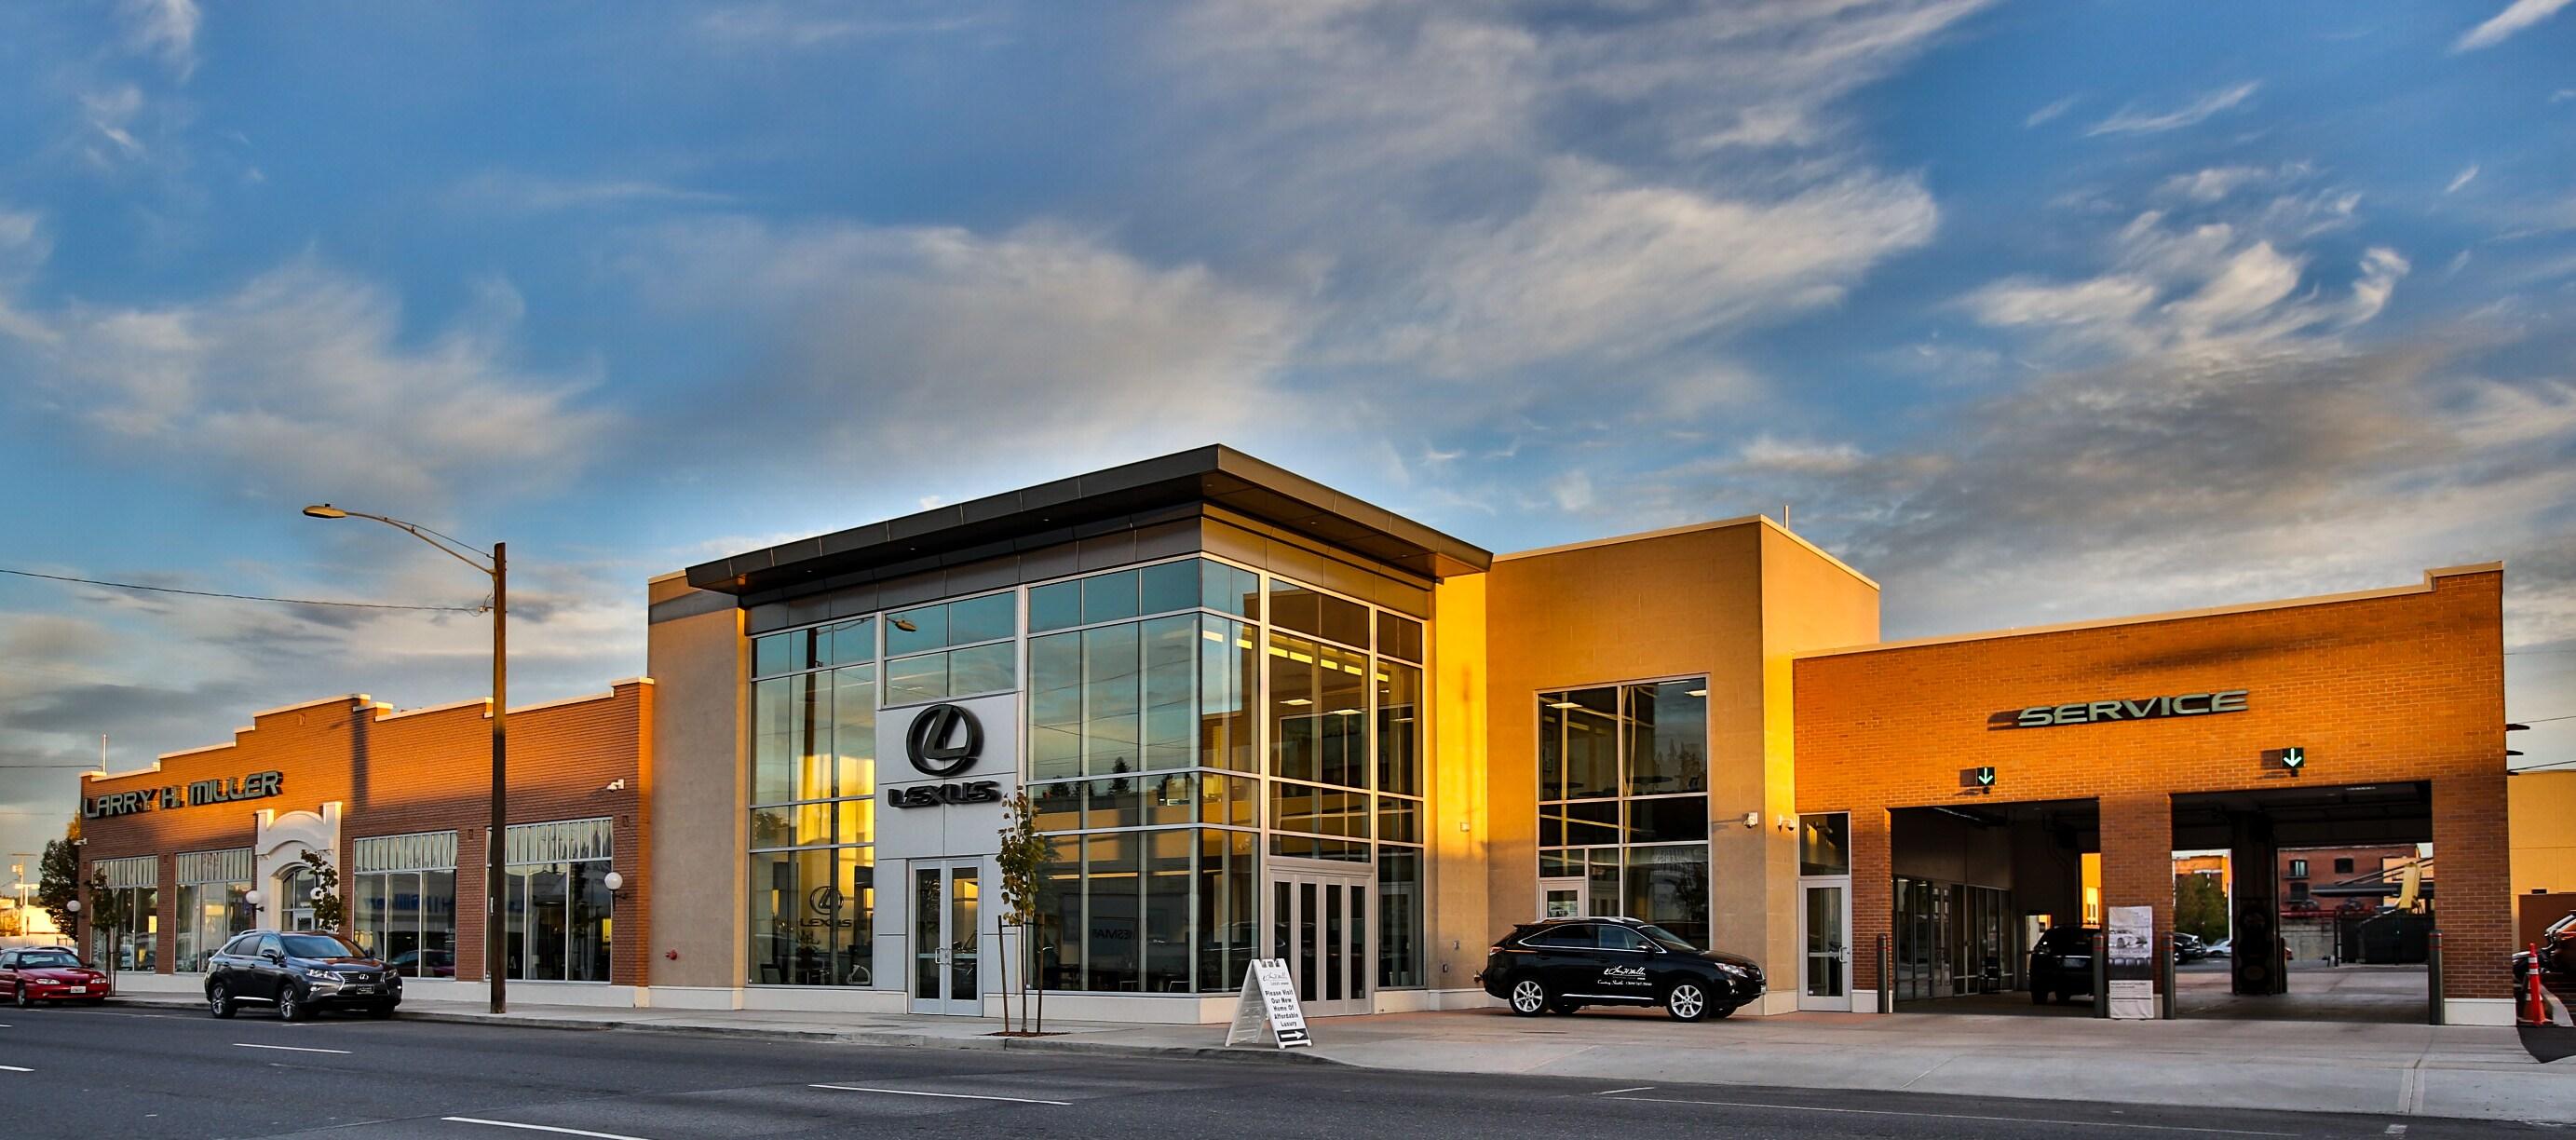 Larry H Miller Lexus of Spokane